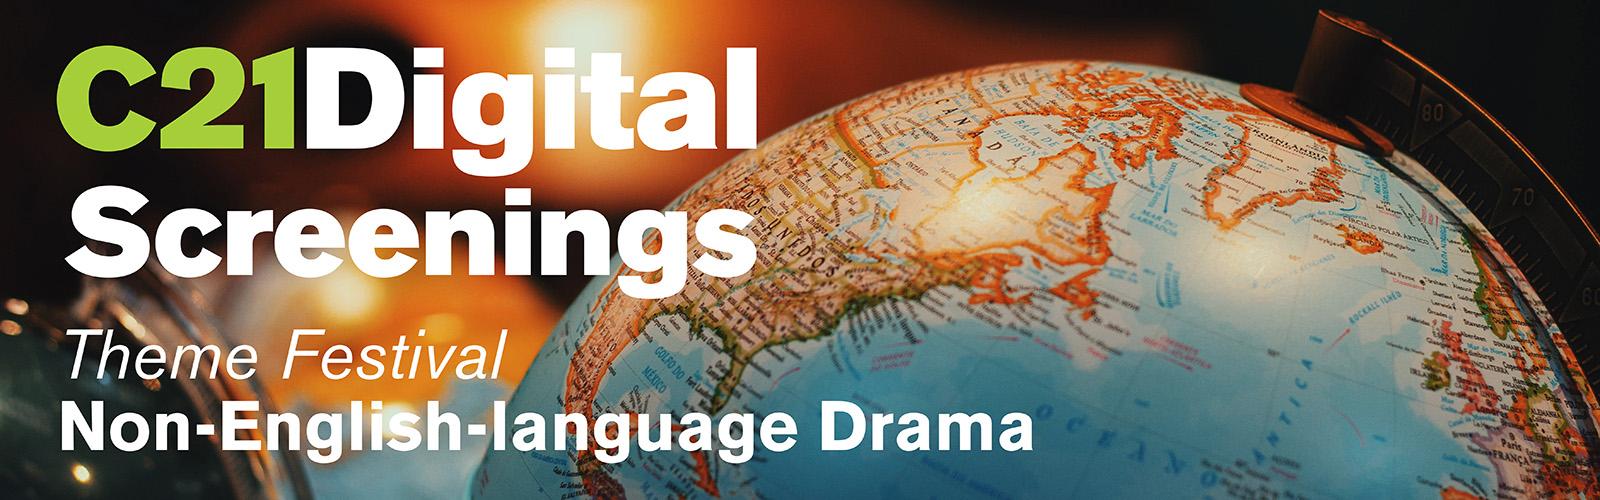 Theme Festival - Non-English Language Drama